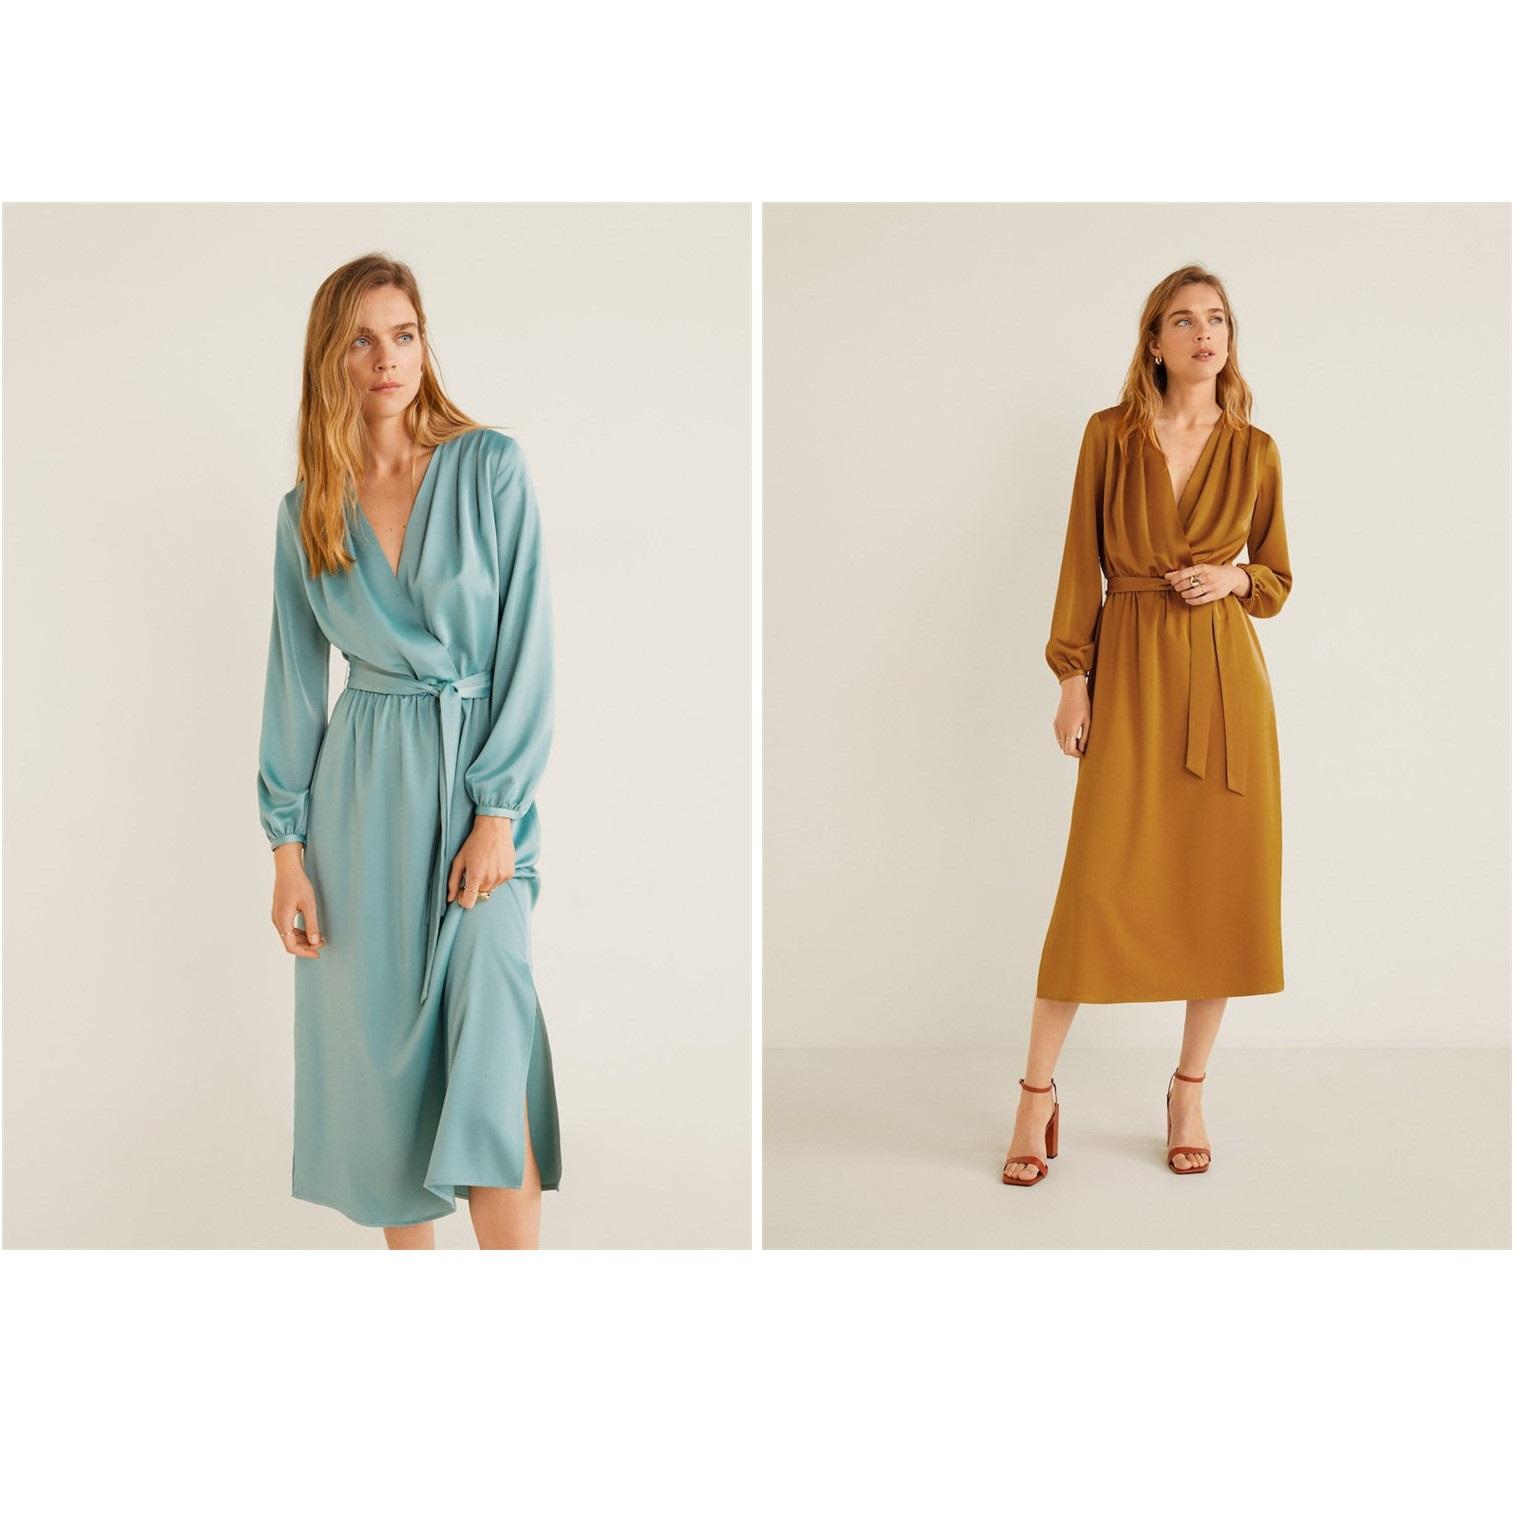 J1纯元 大范女士新款 连衣裙2019年秋款缎面 质感好满30元可用5元优惠券